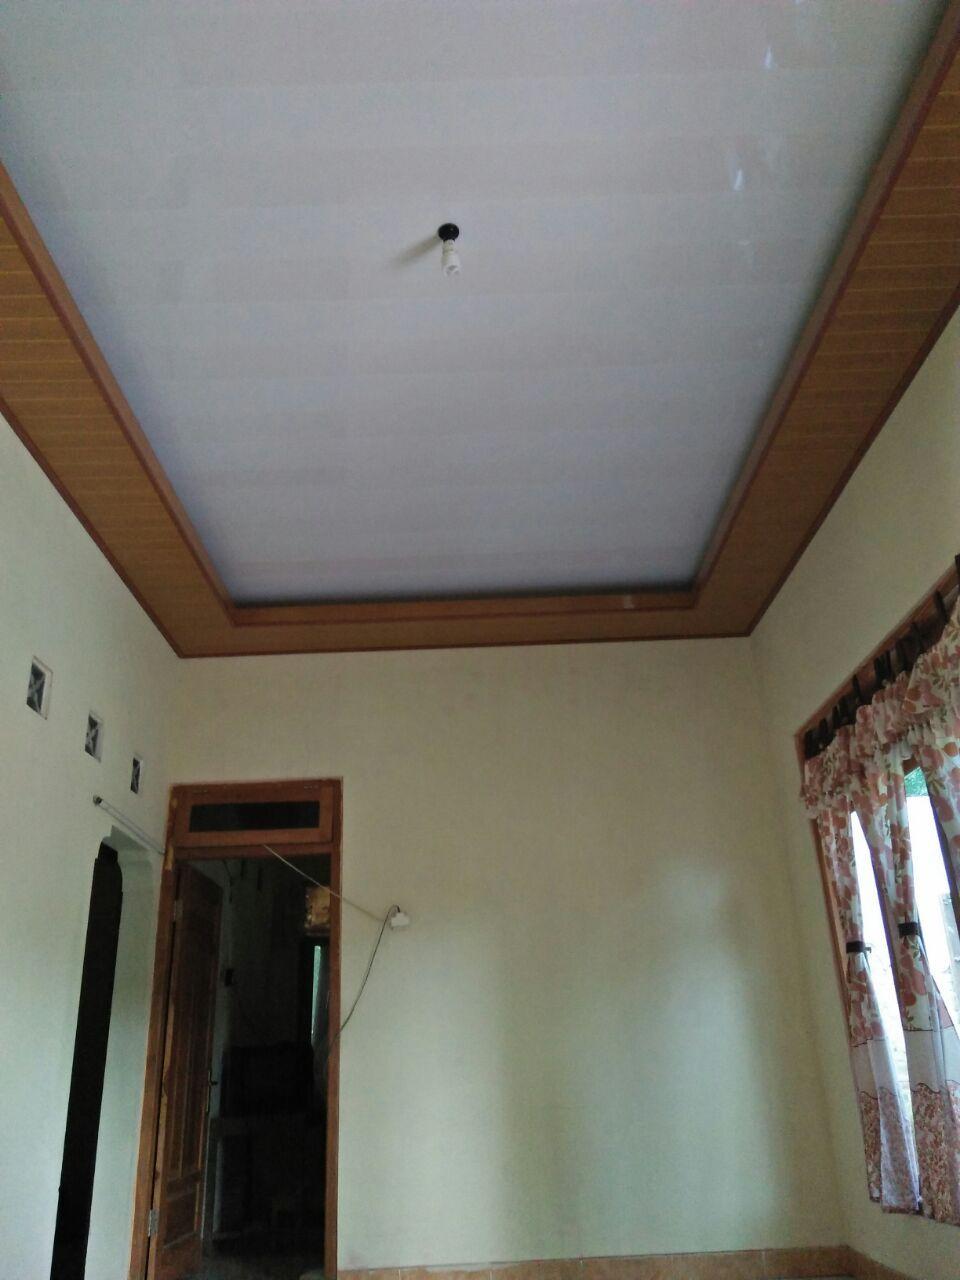 081 376 986 067 Plafon PVC 185 Rb Untuk Plafon Pvc Tingkat Ada